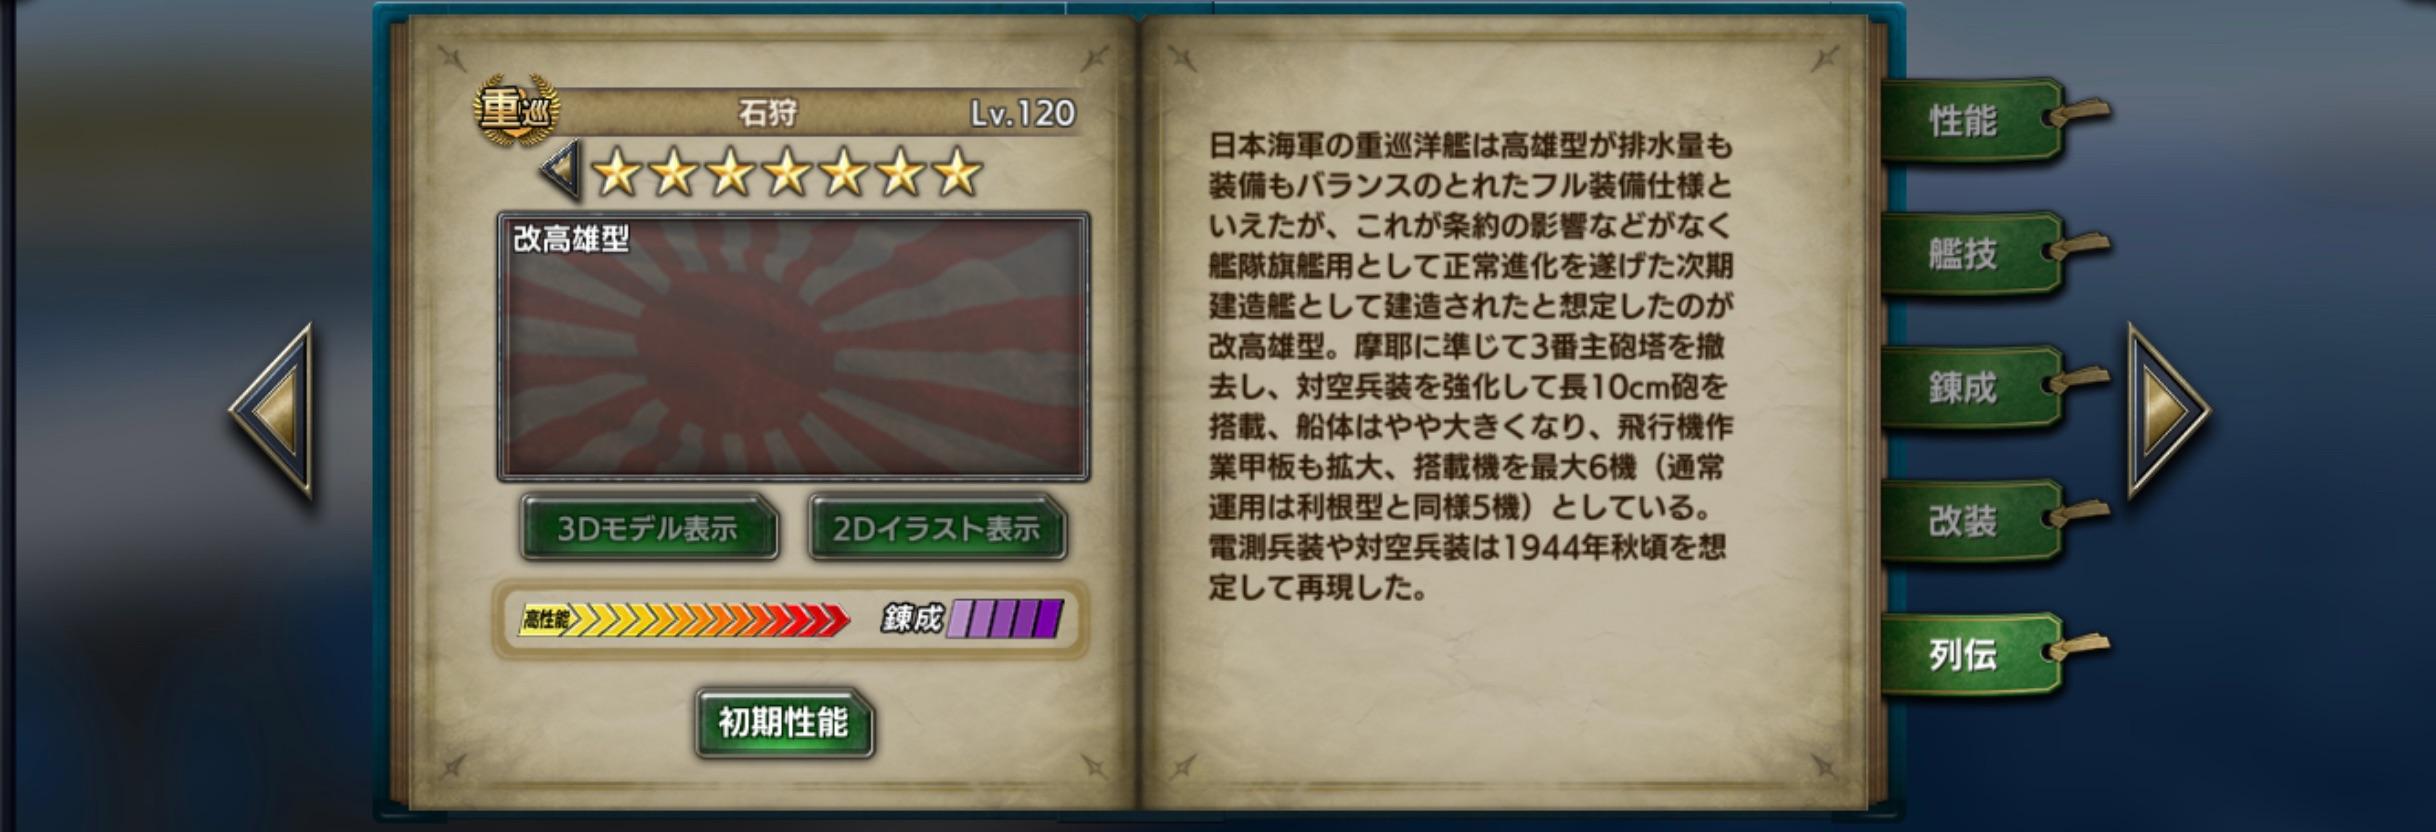 Isikari-history